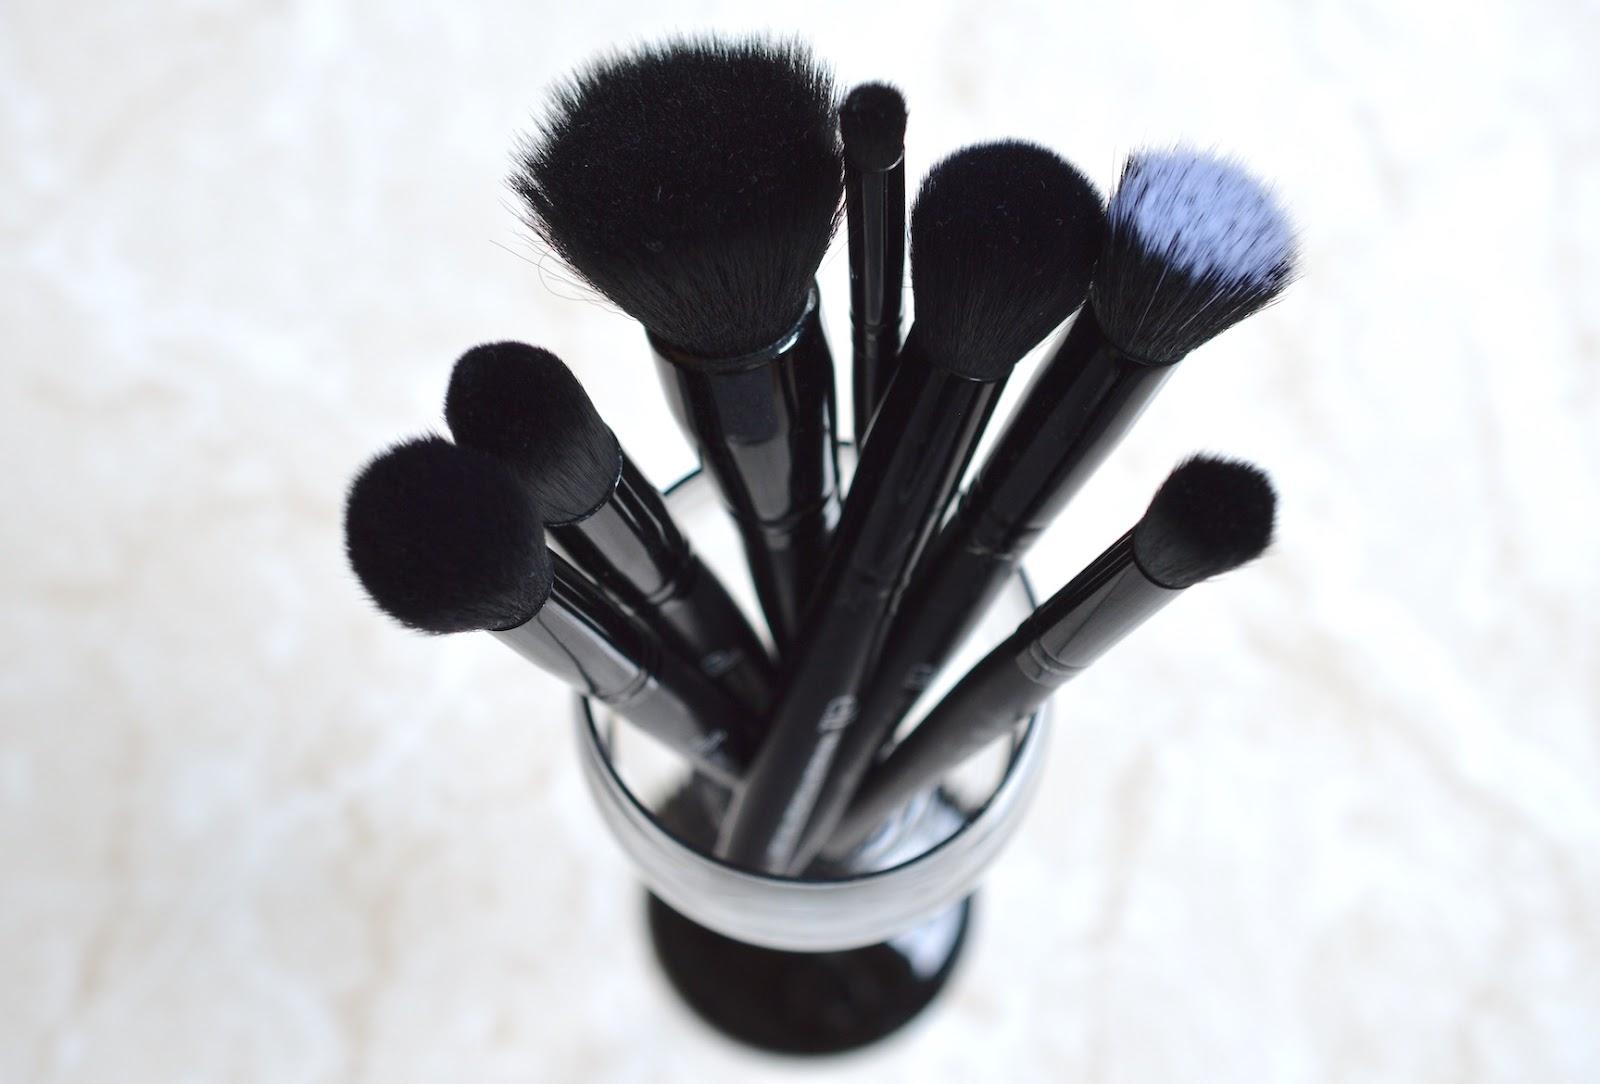 e.l.f. studio makeup brushes